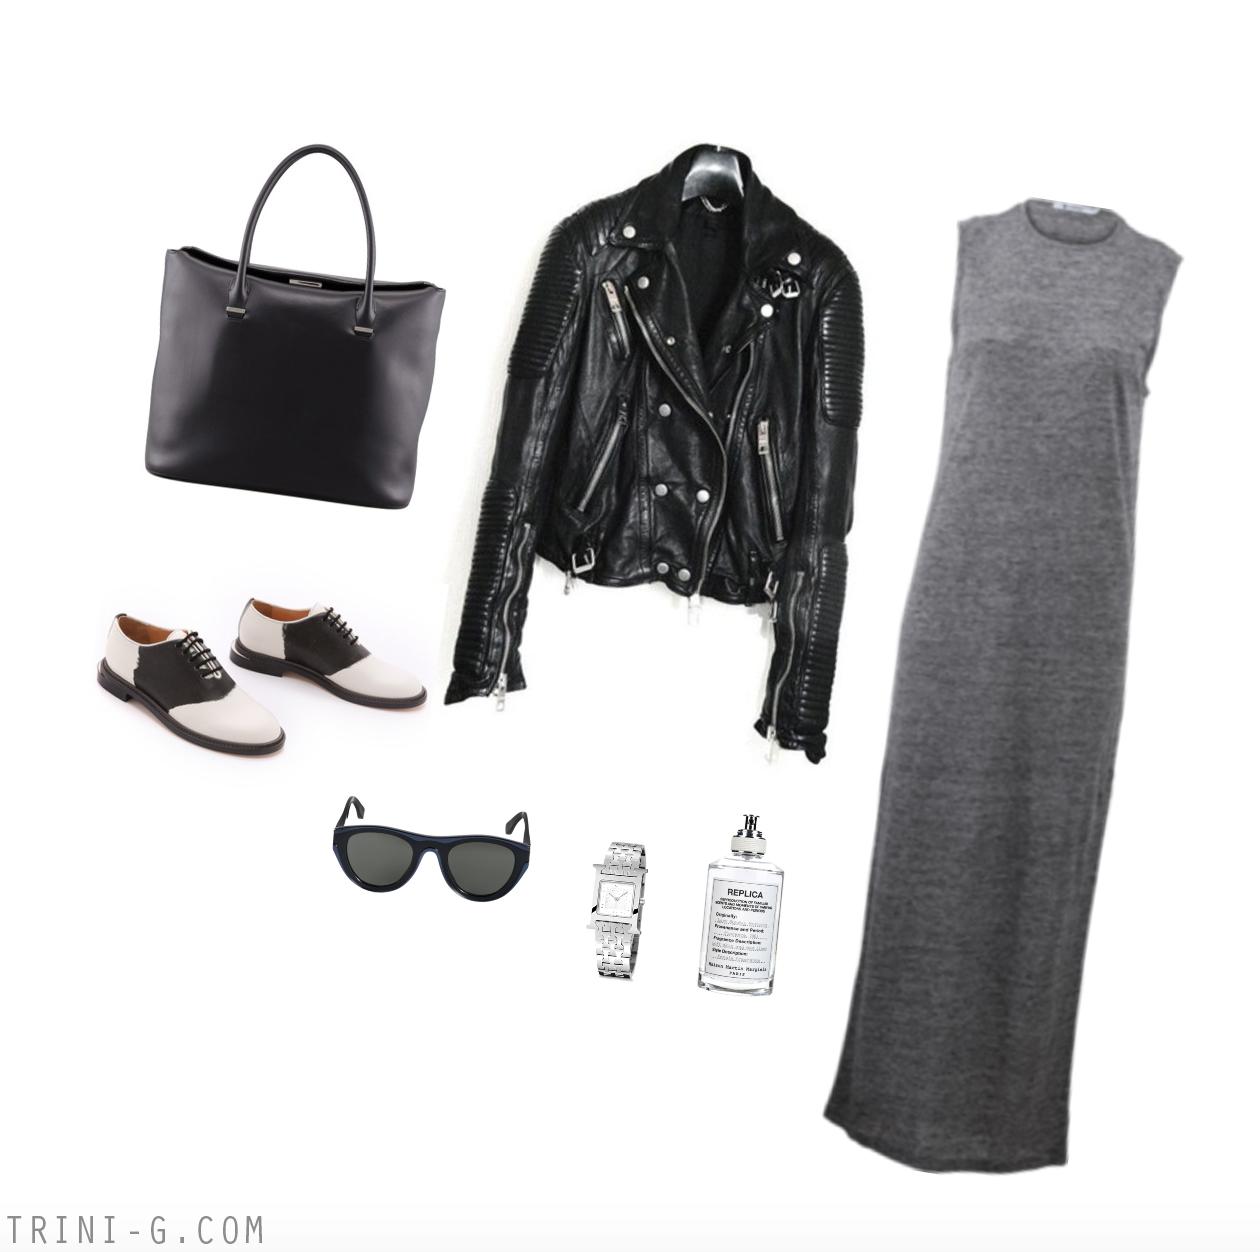 Trini blog | April Outfit 2